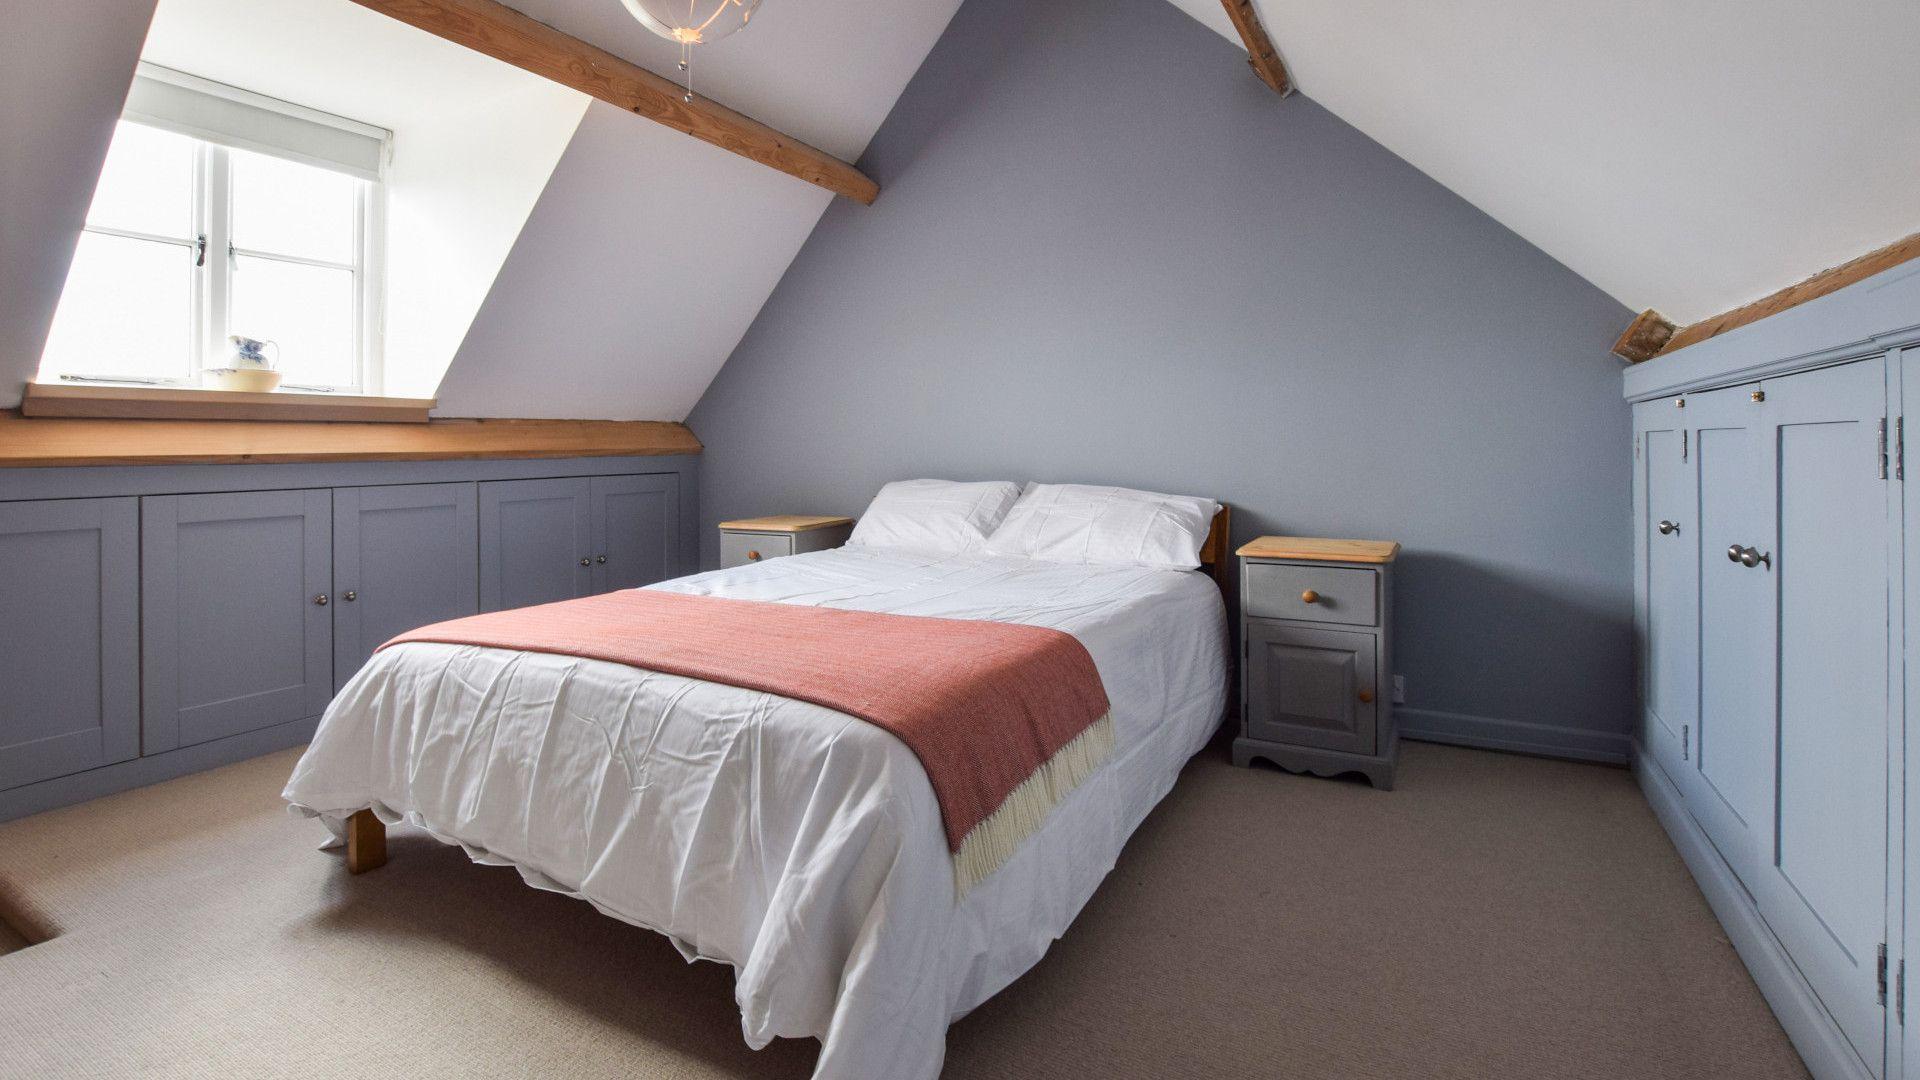 Bedroom 1,  27 Horsefair, Bolthole Retreats